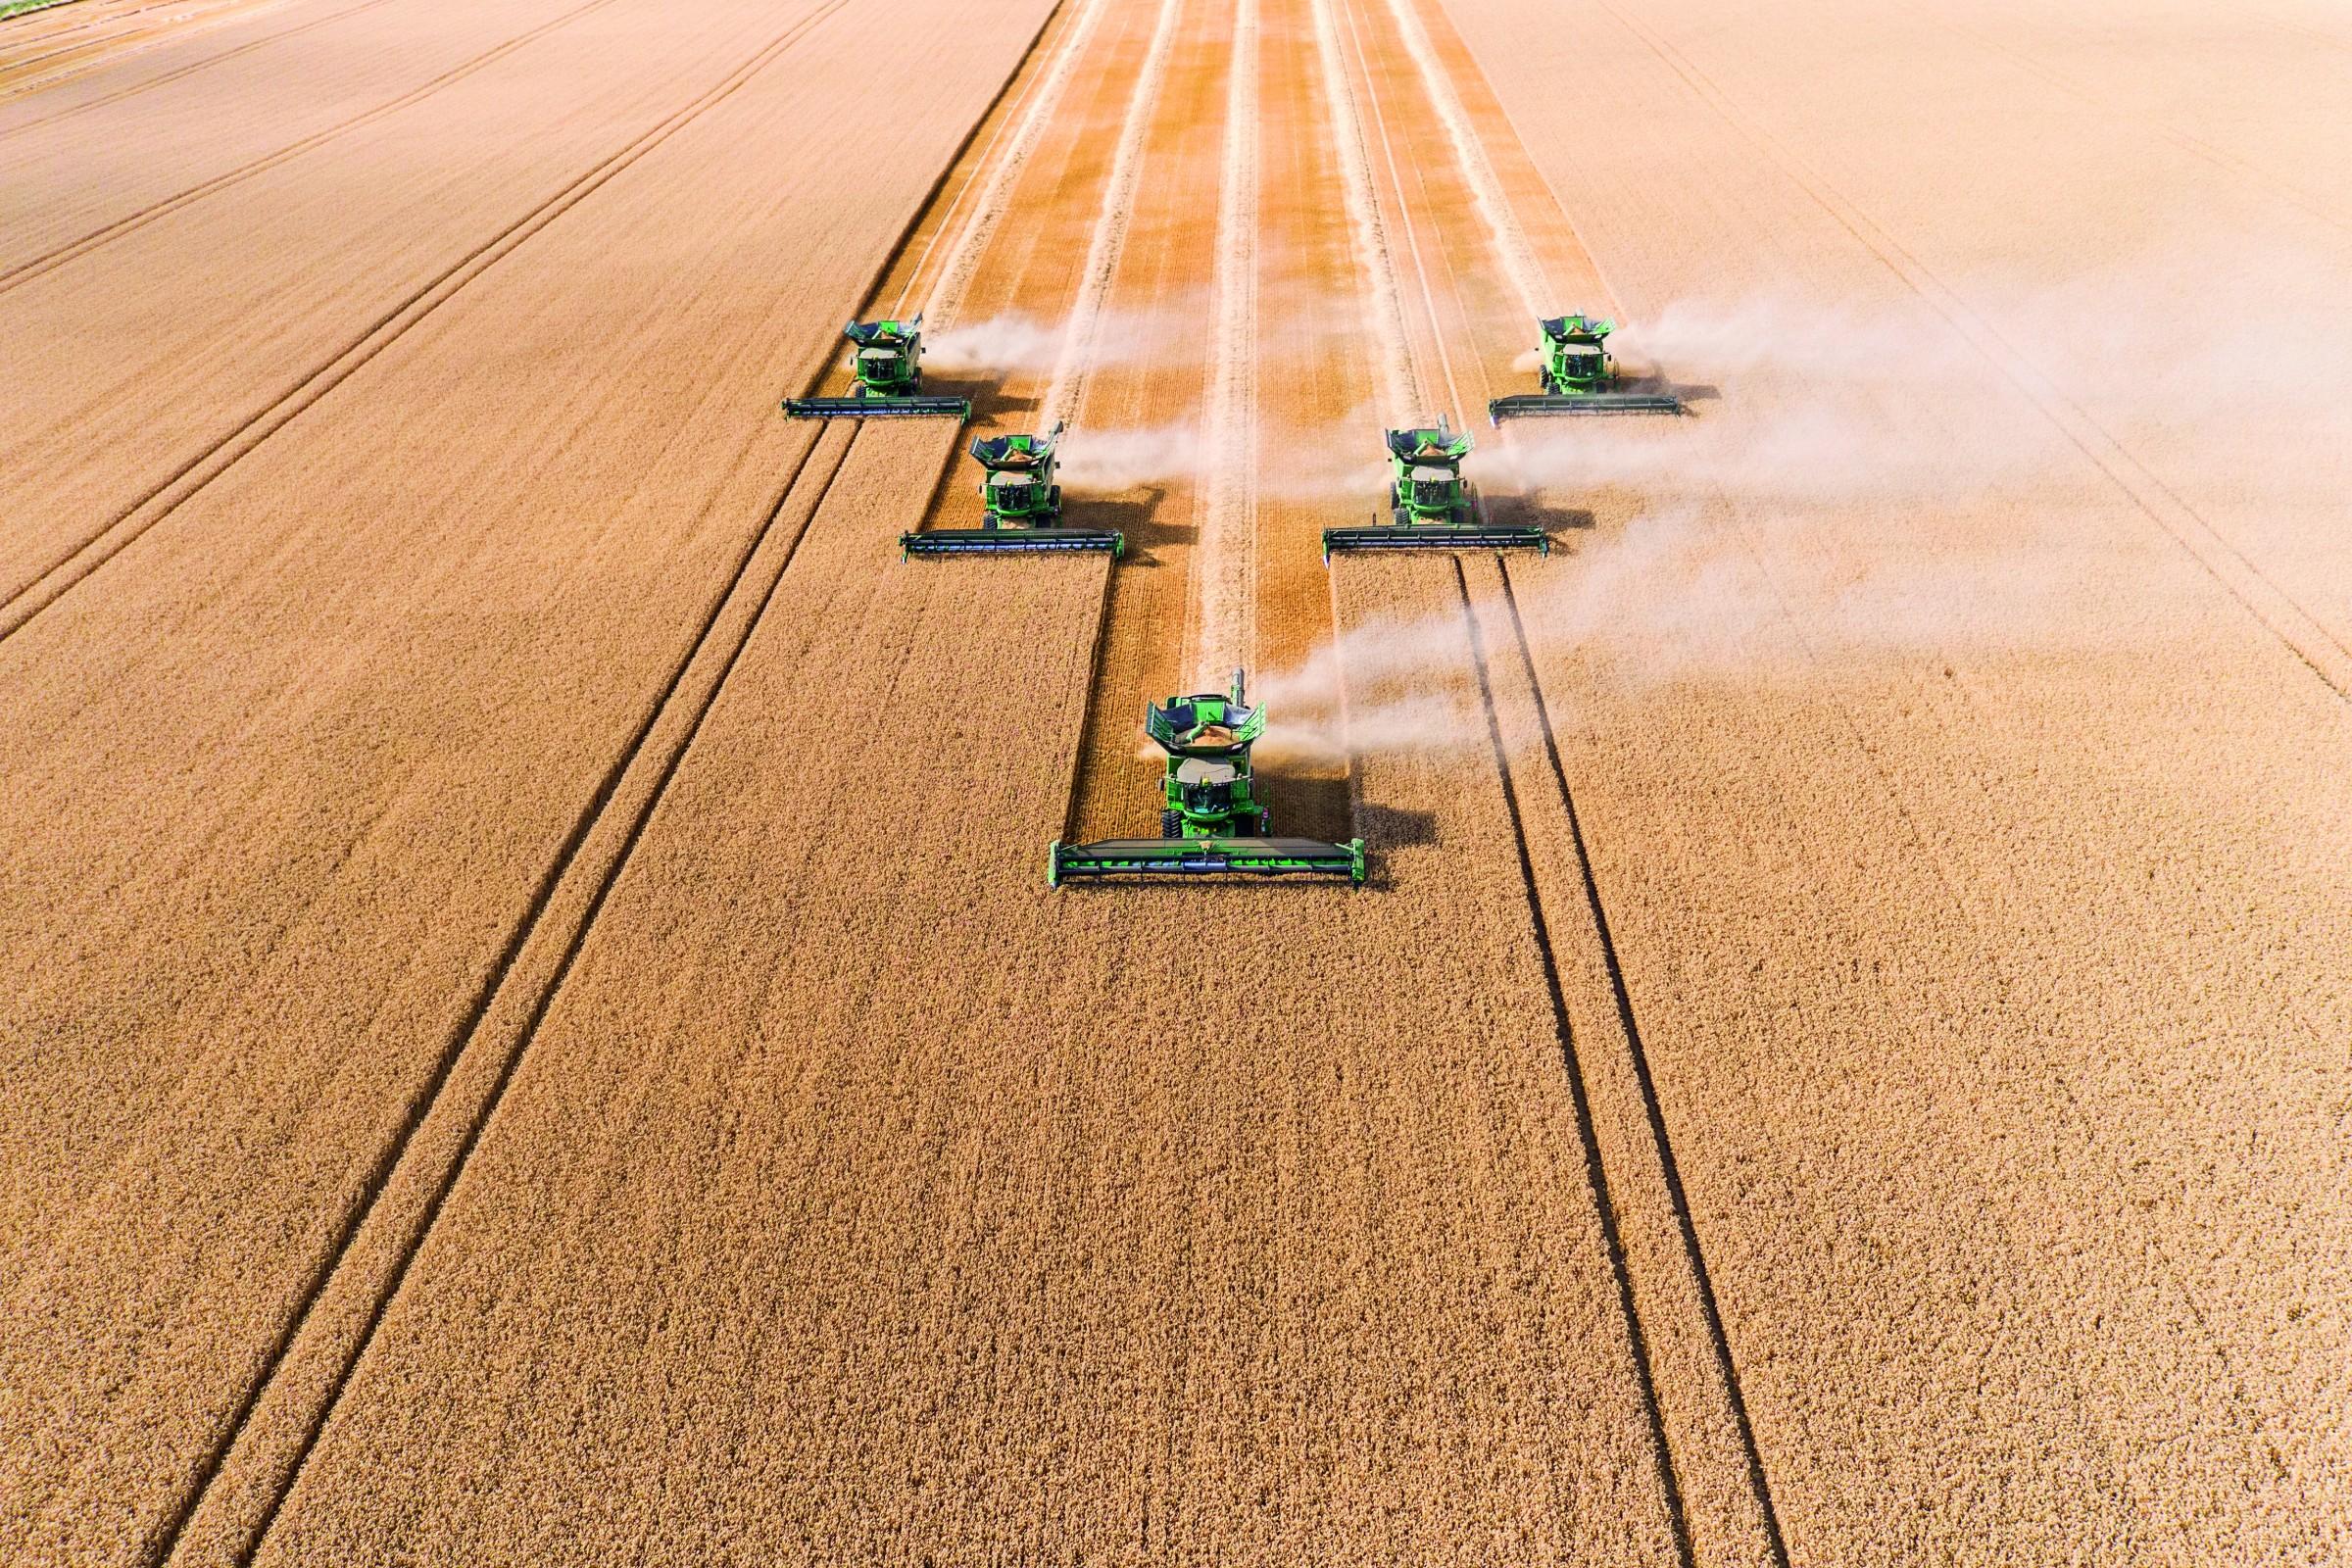 Farms & Agrovista Regional Trial Event (CANCELLED)